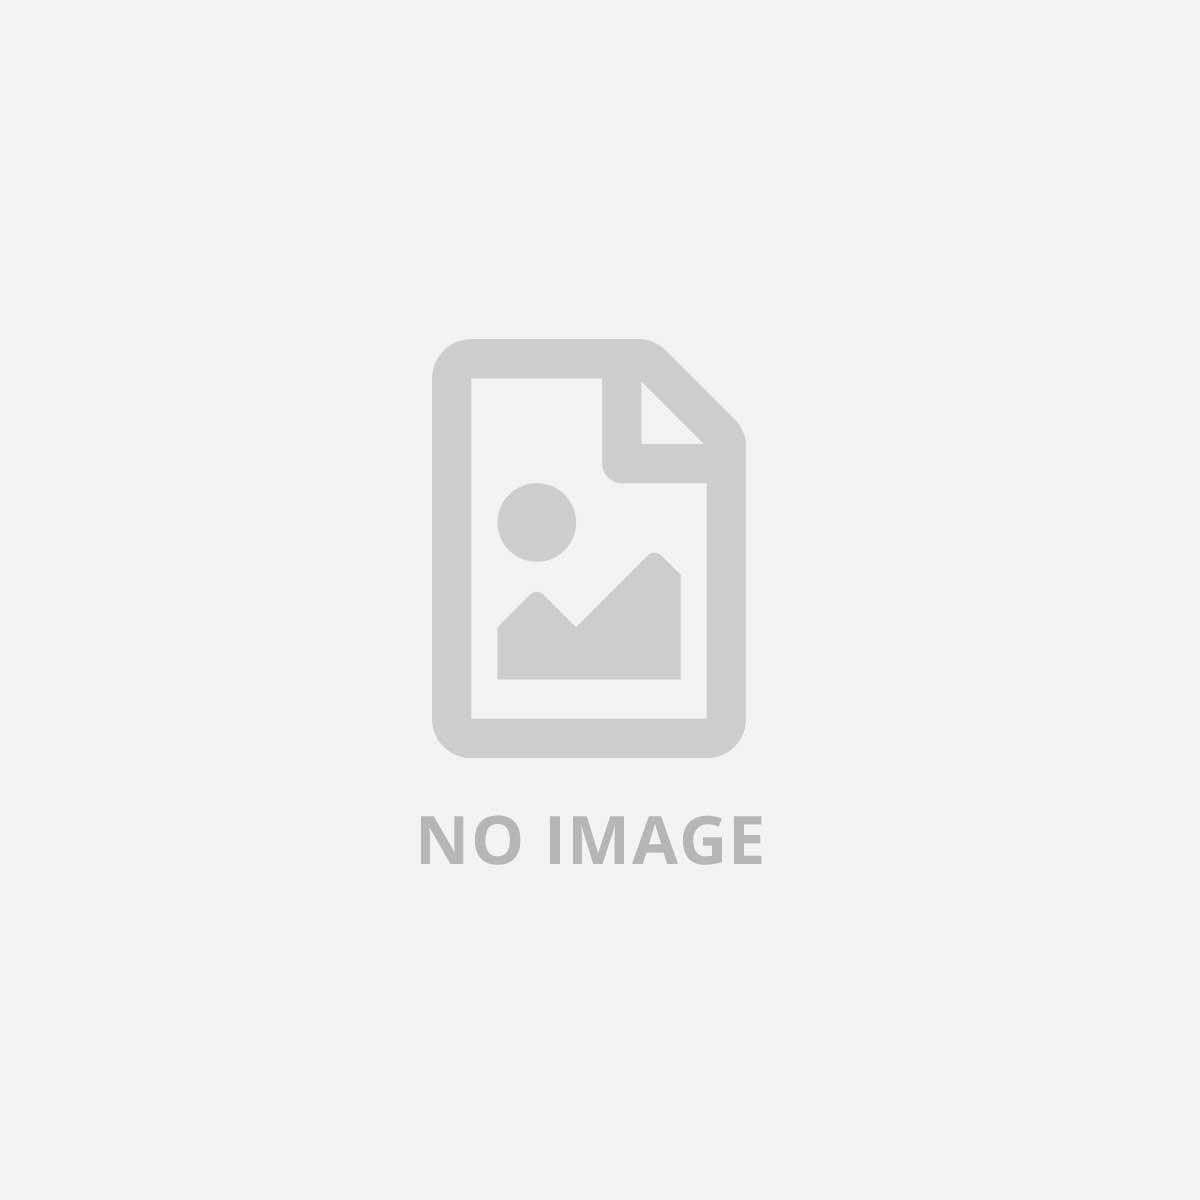 KINGSTON MOBILELITE DUO 3C USB3.1